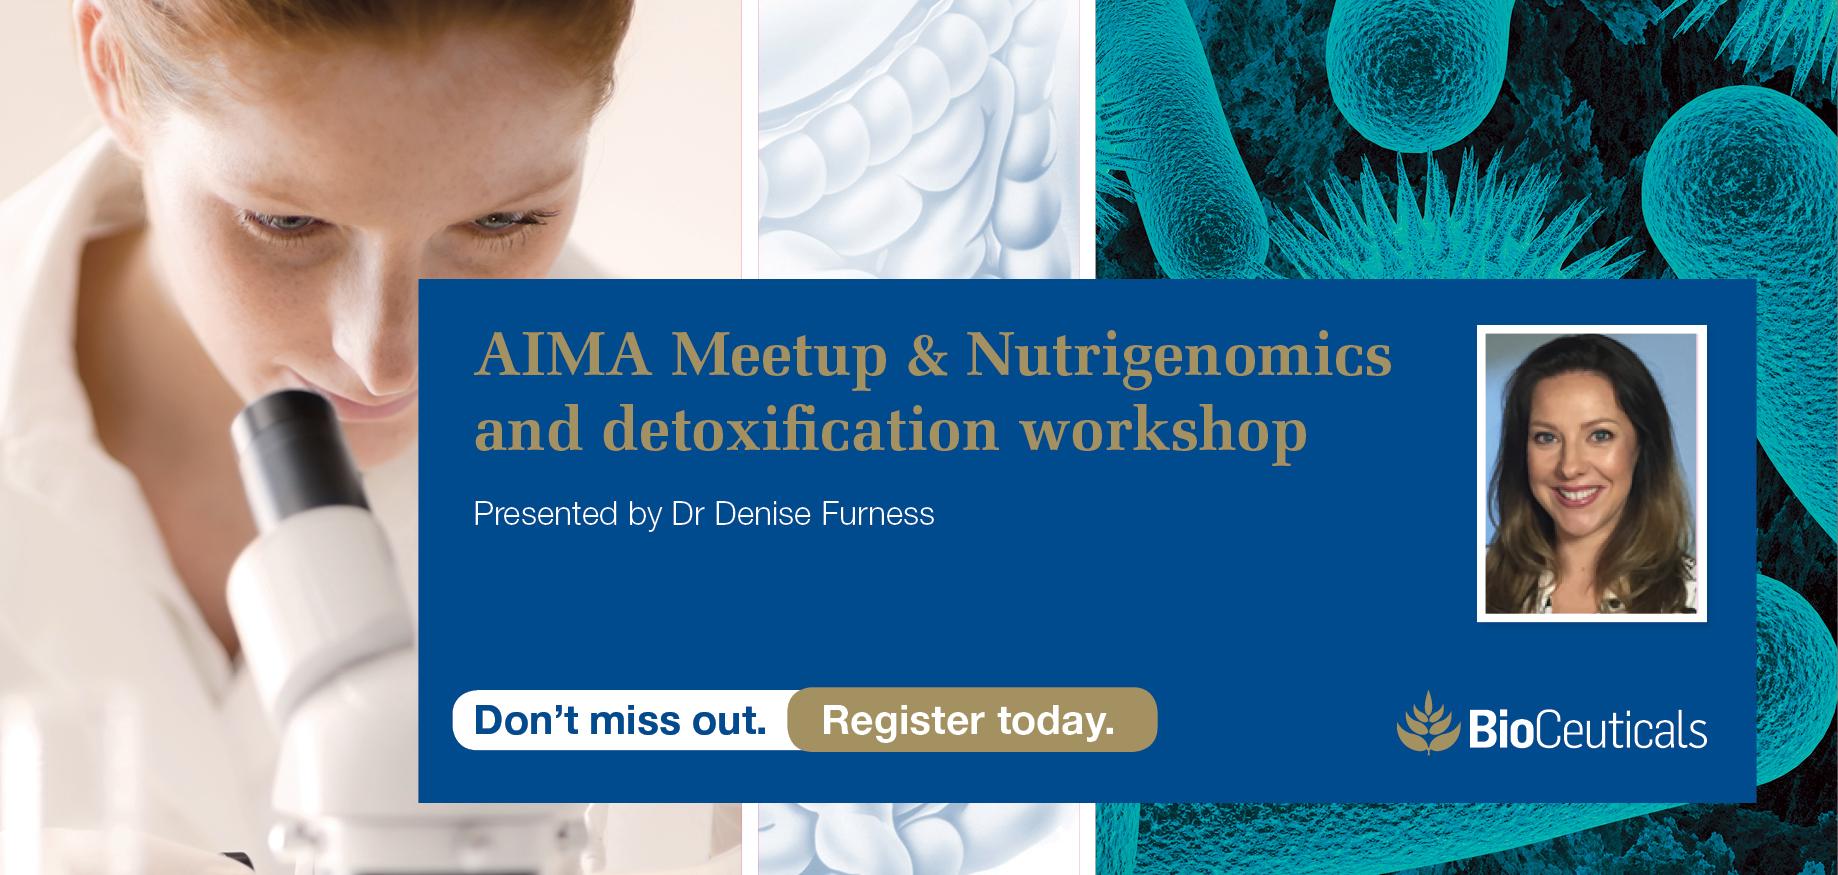 AIMA Meetup & Nutrigenomics and detoxification workshop: Sydney